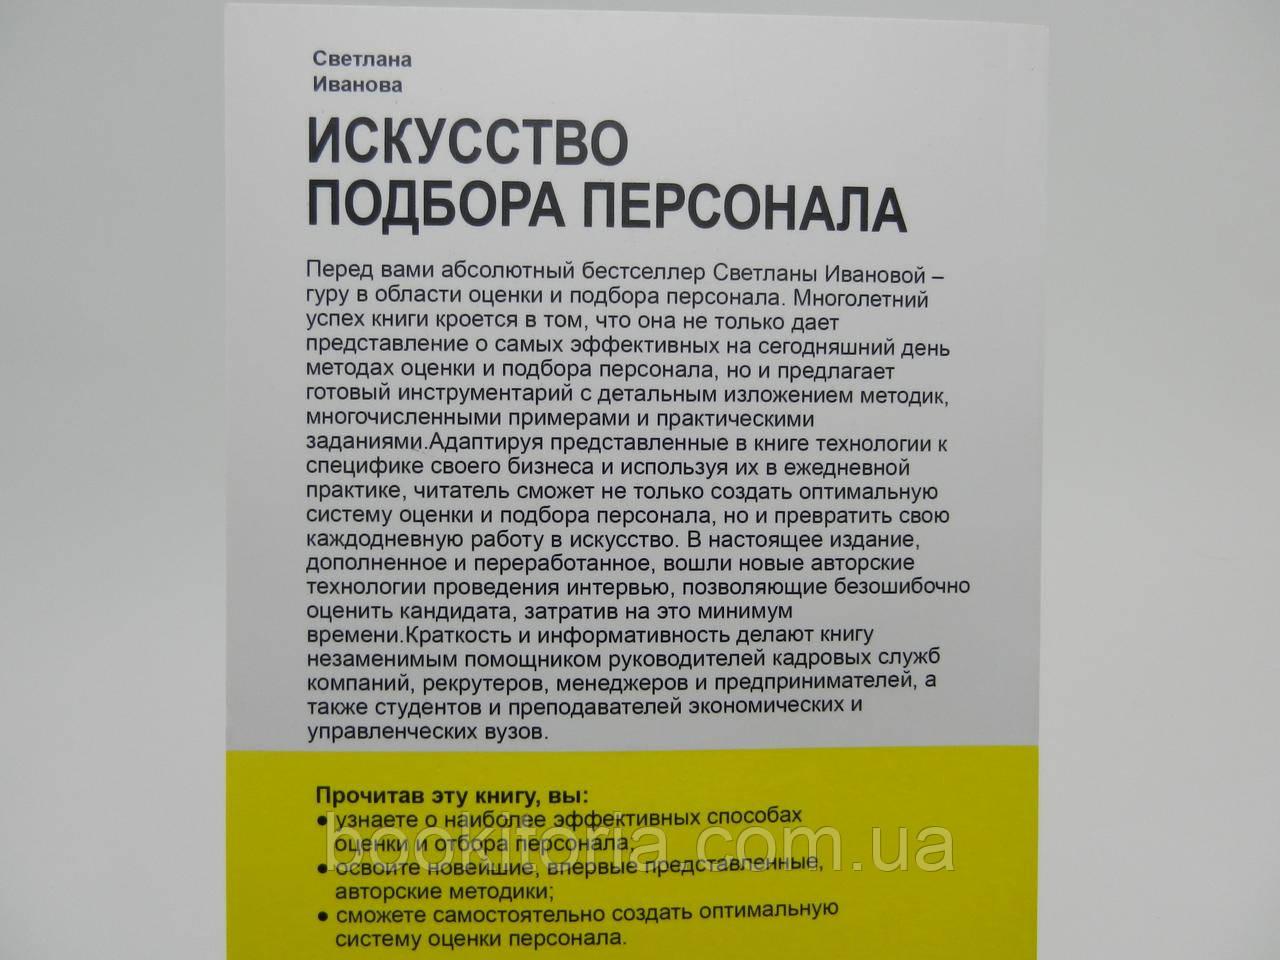 Иванова С. Искусство подбора персонала. - фото 7